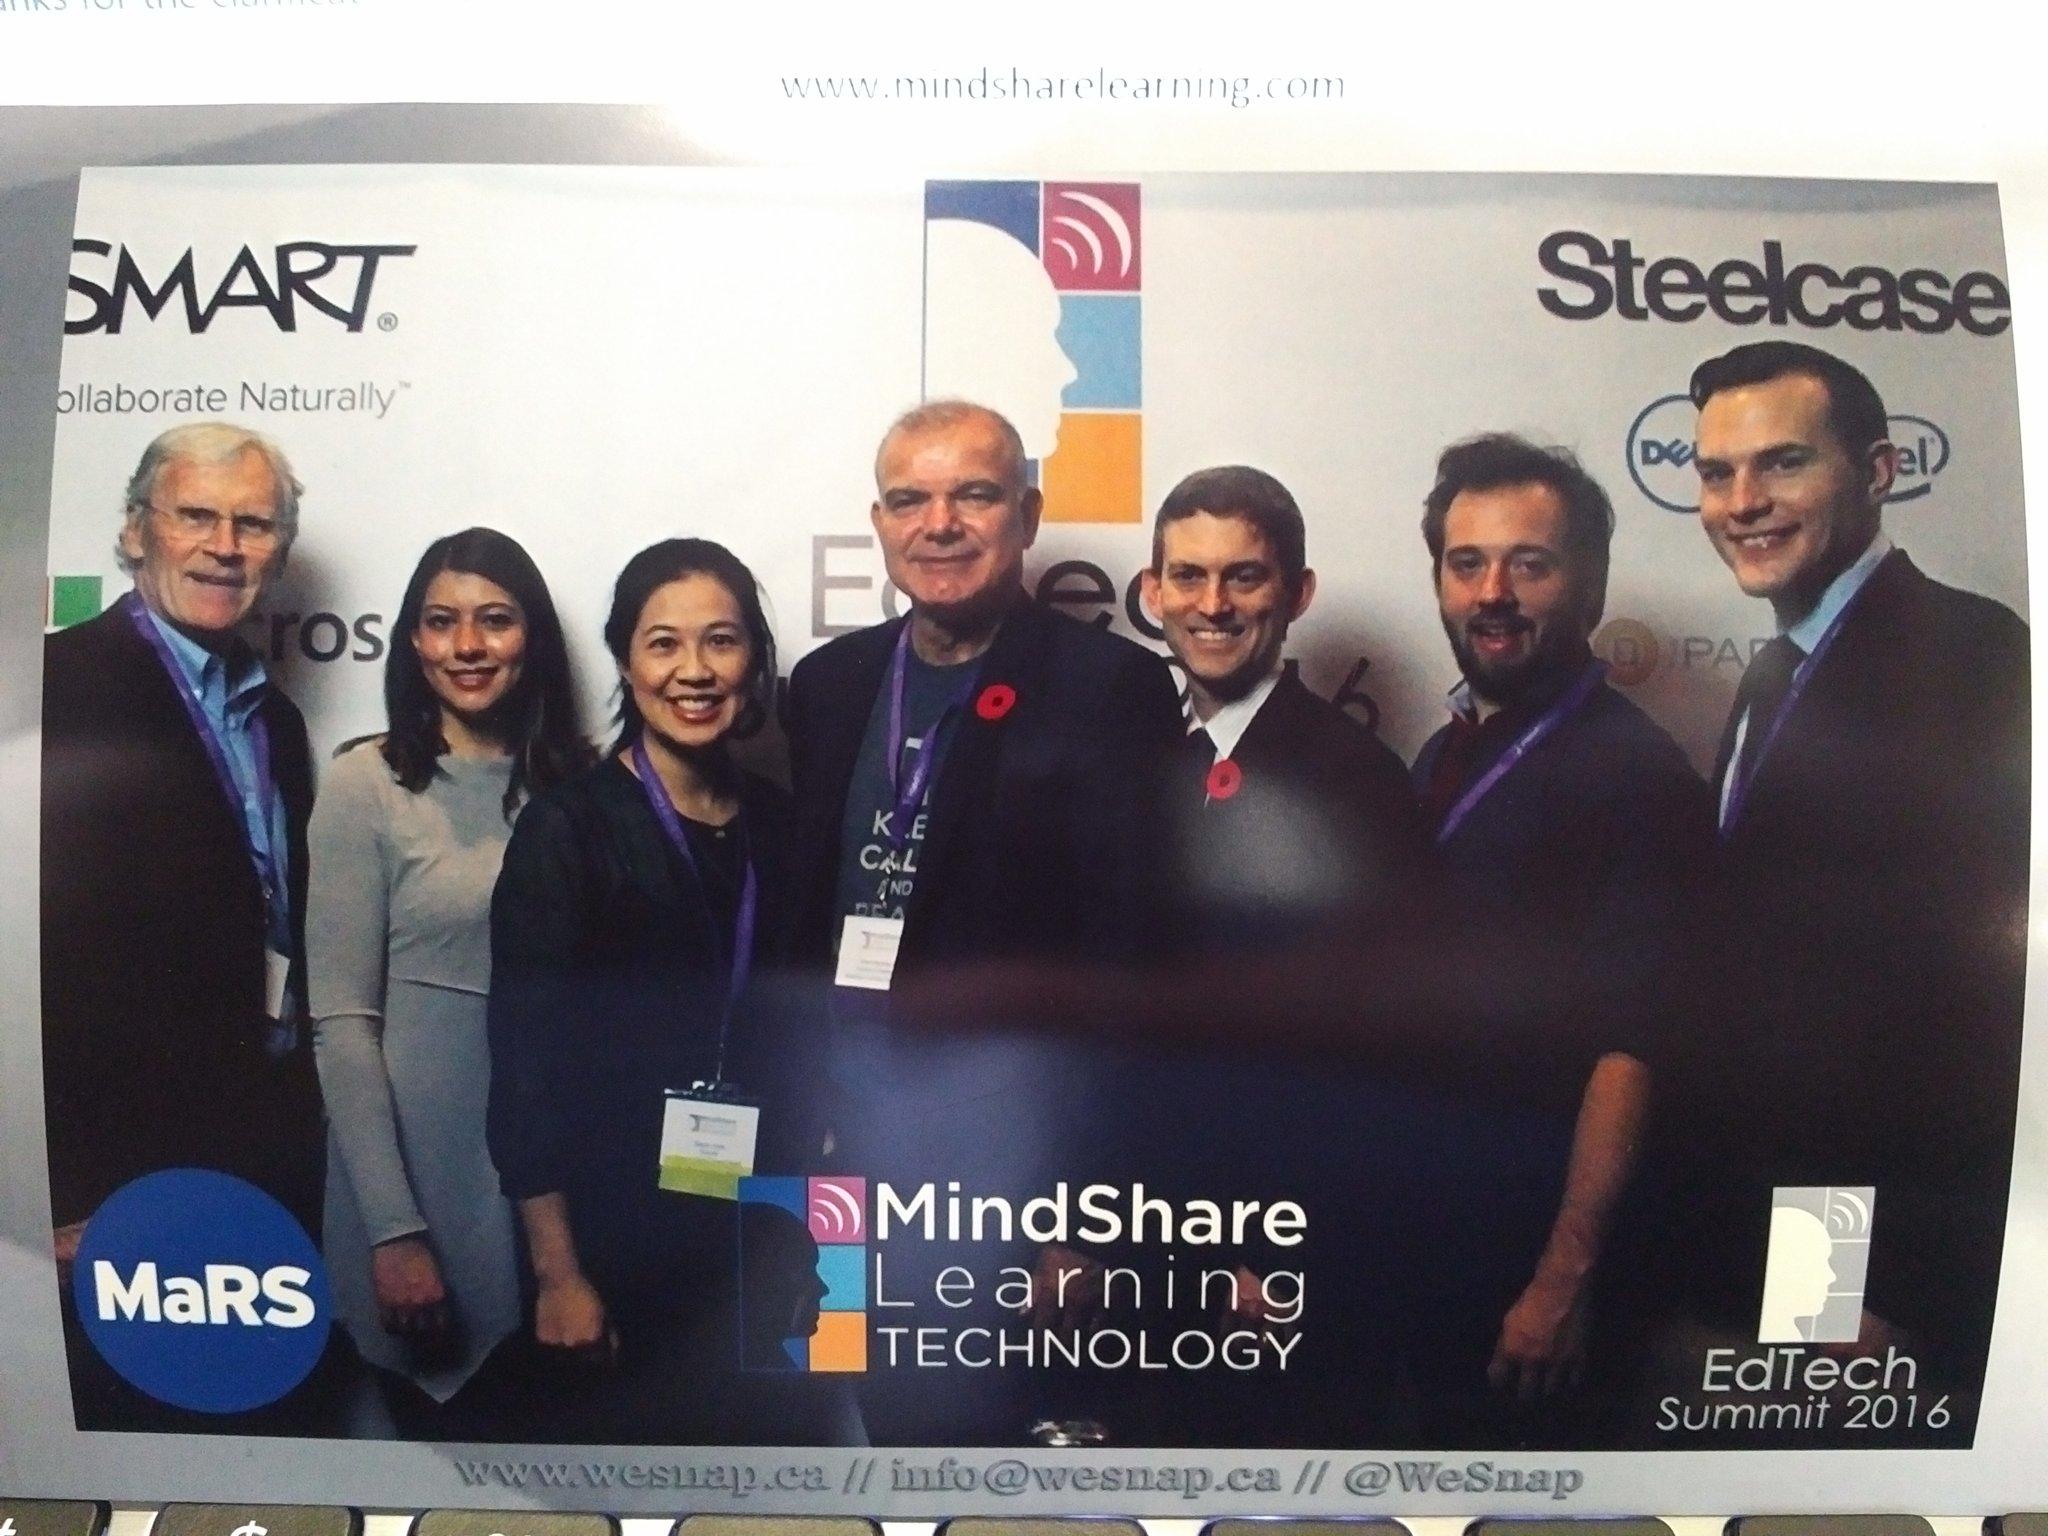 Thanks to #TeamMindshare for helping make our #cdnedtech16 Summit a success! @MindShareNews @MindShareK12 @schowOnt @missdinucci1 #EdTech https://t.co/dzAGMJhdbD